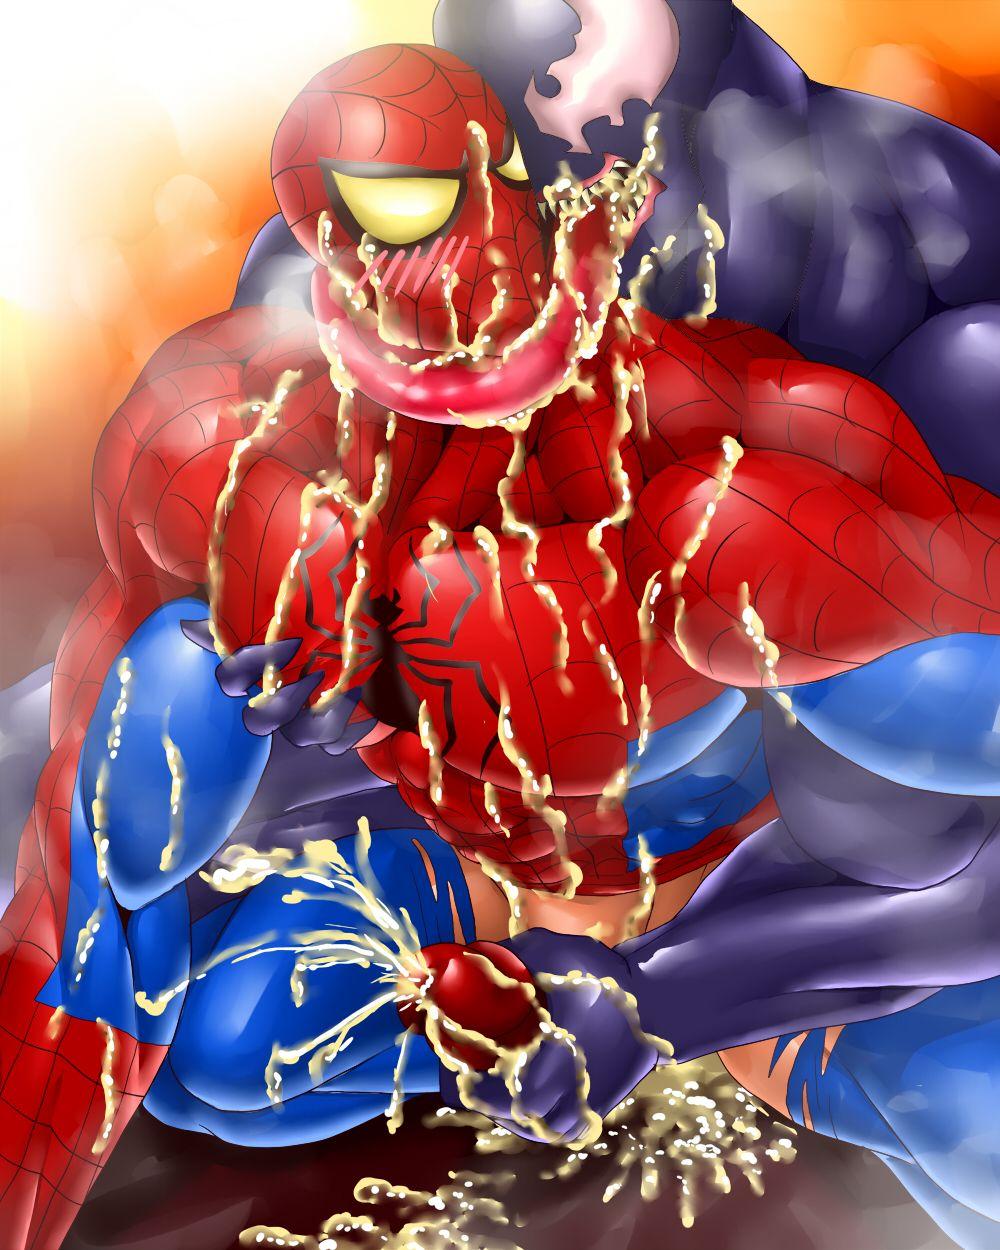 Spiderman porn cartoons